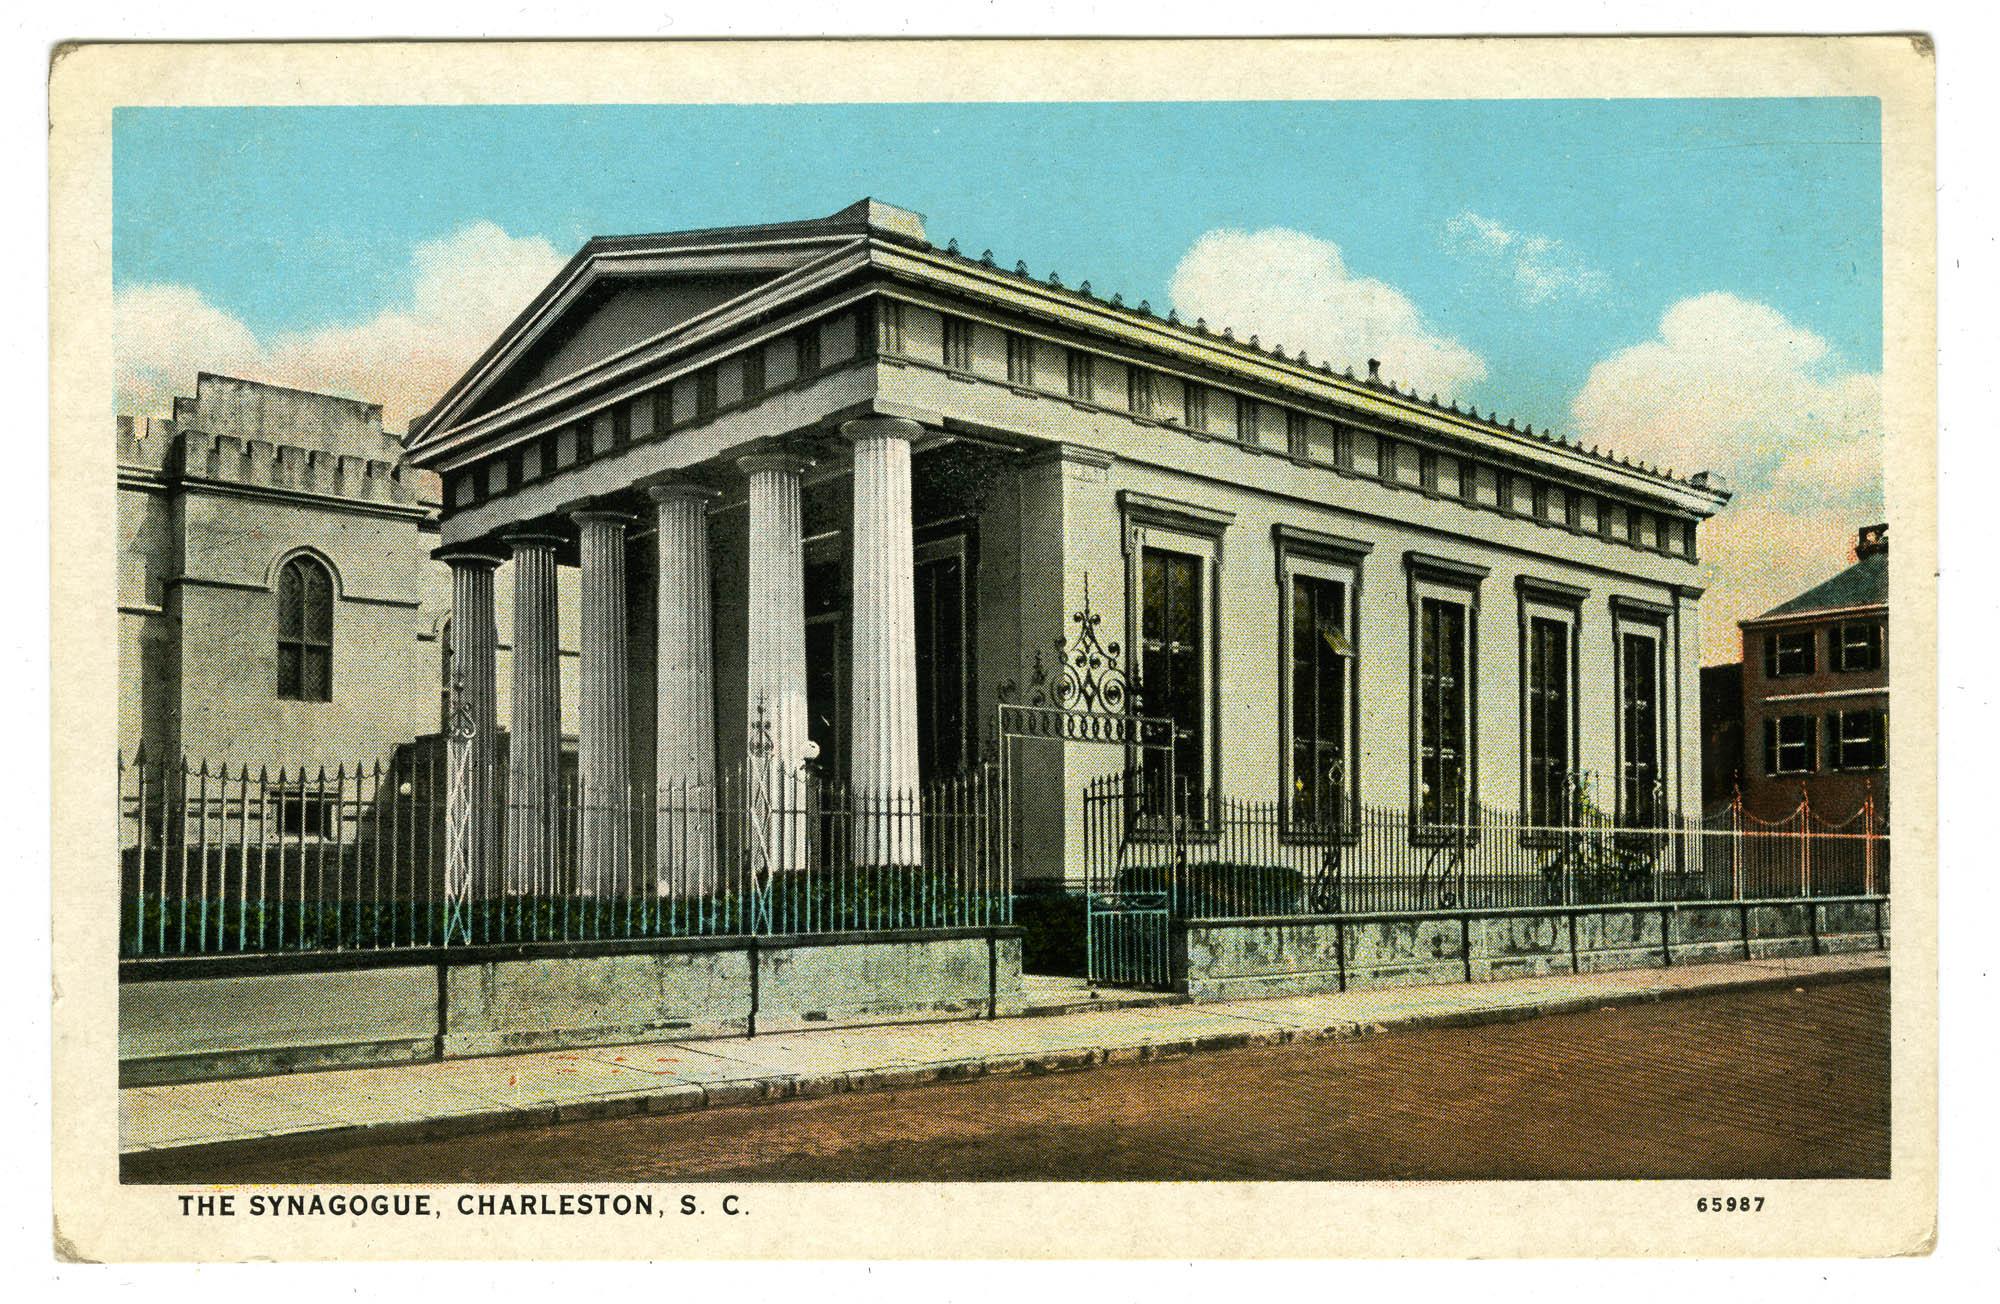 The synagogue, Charleston, S.C.